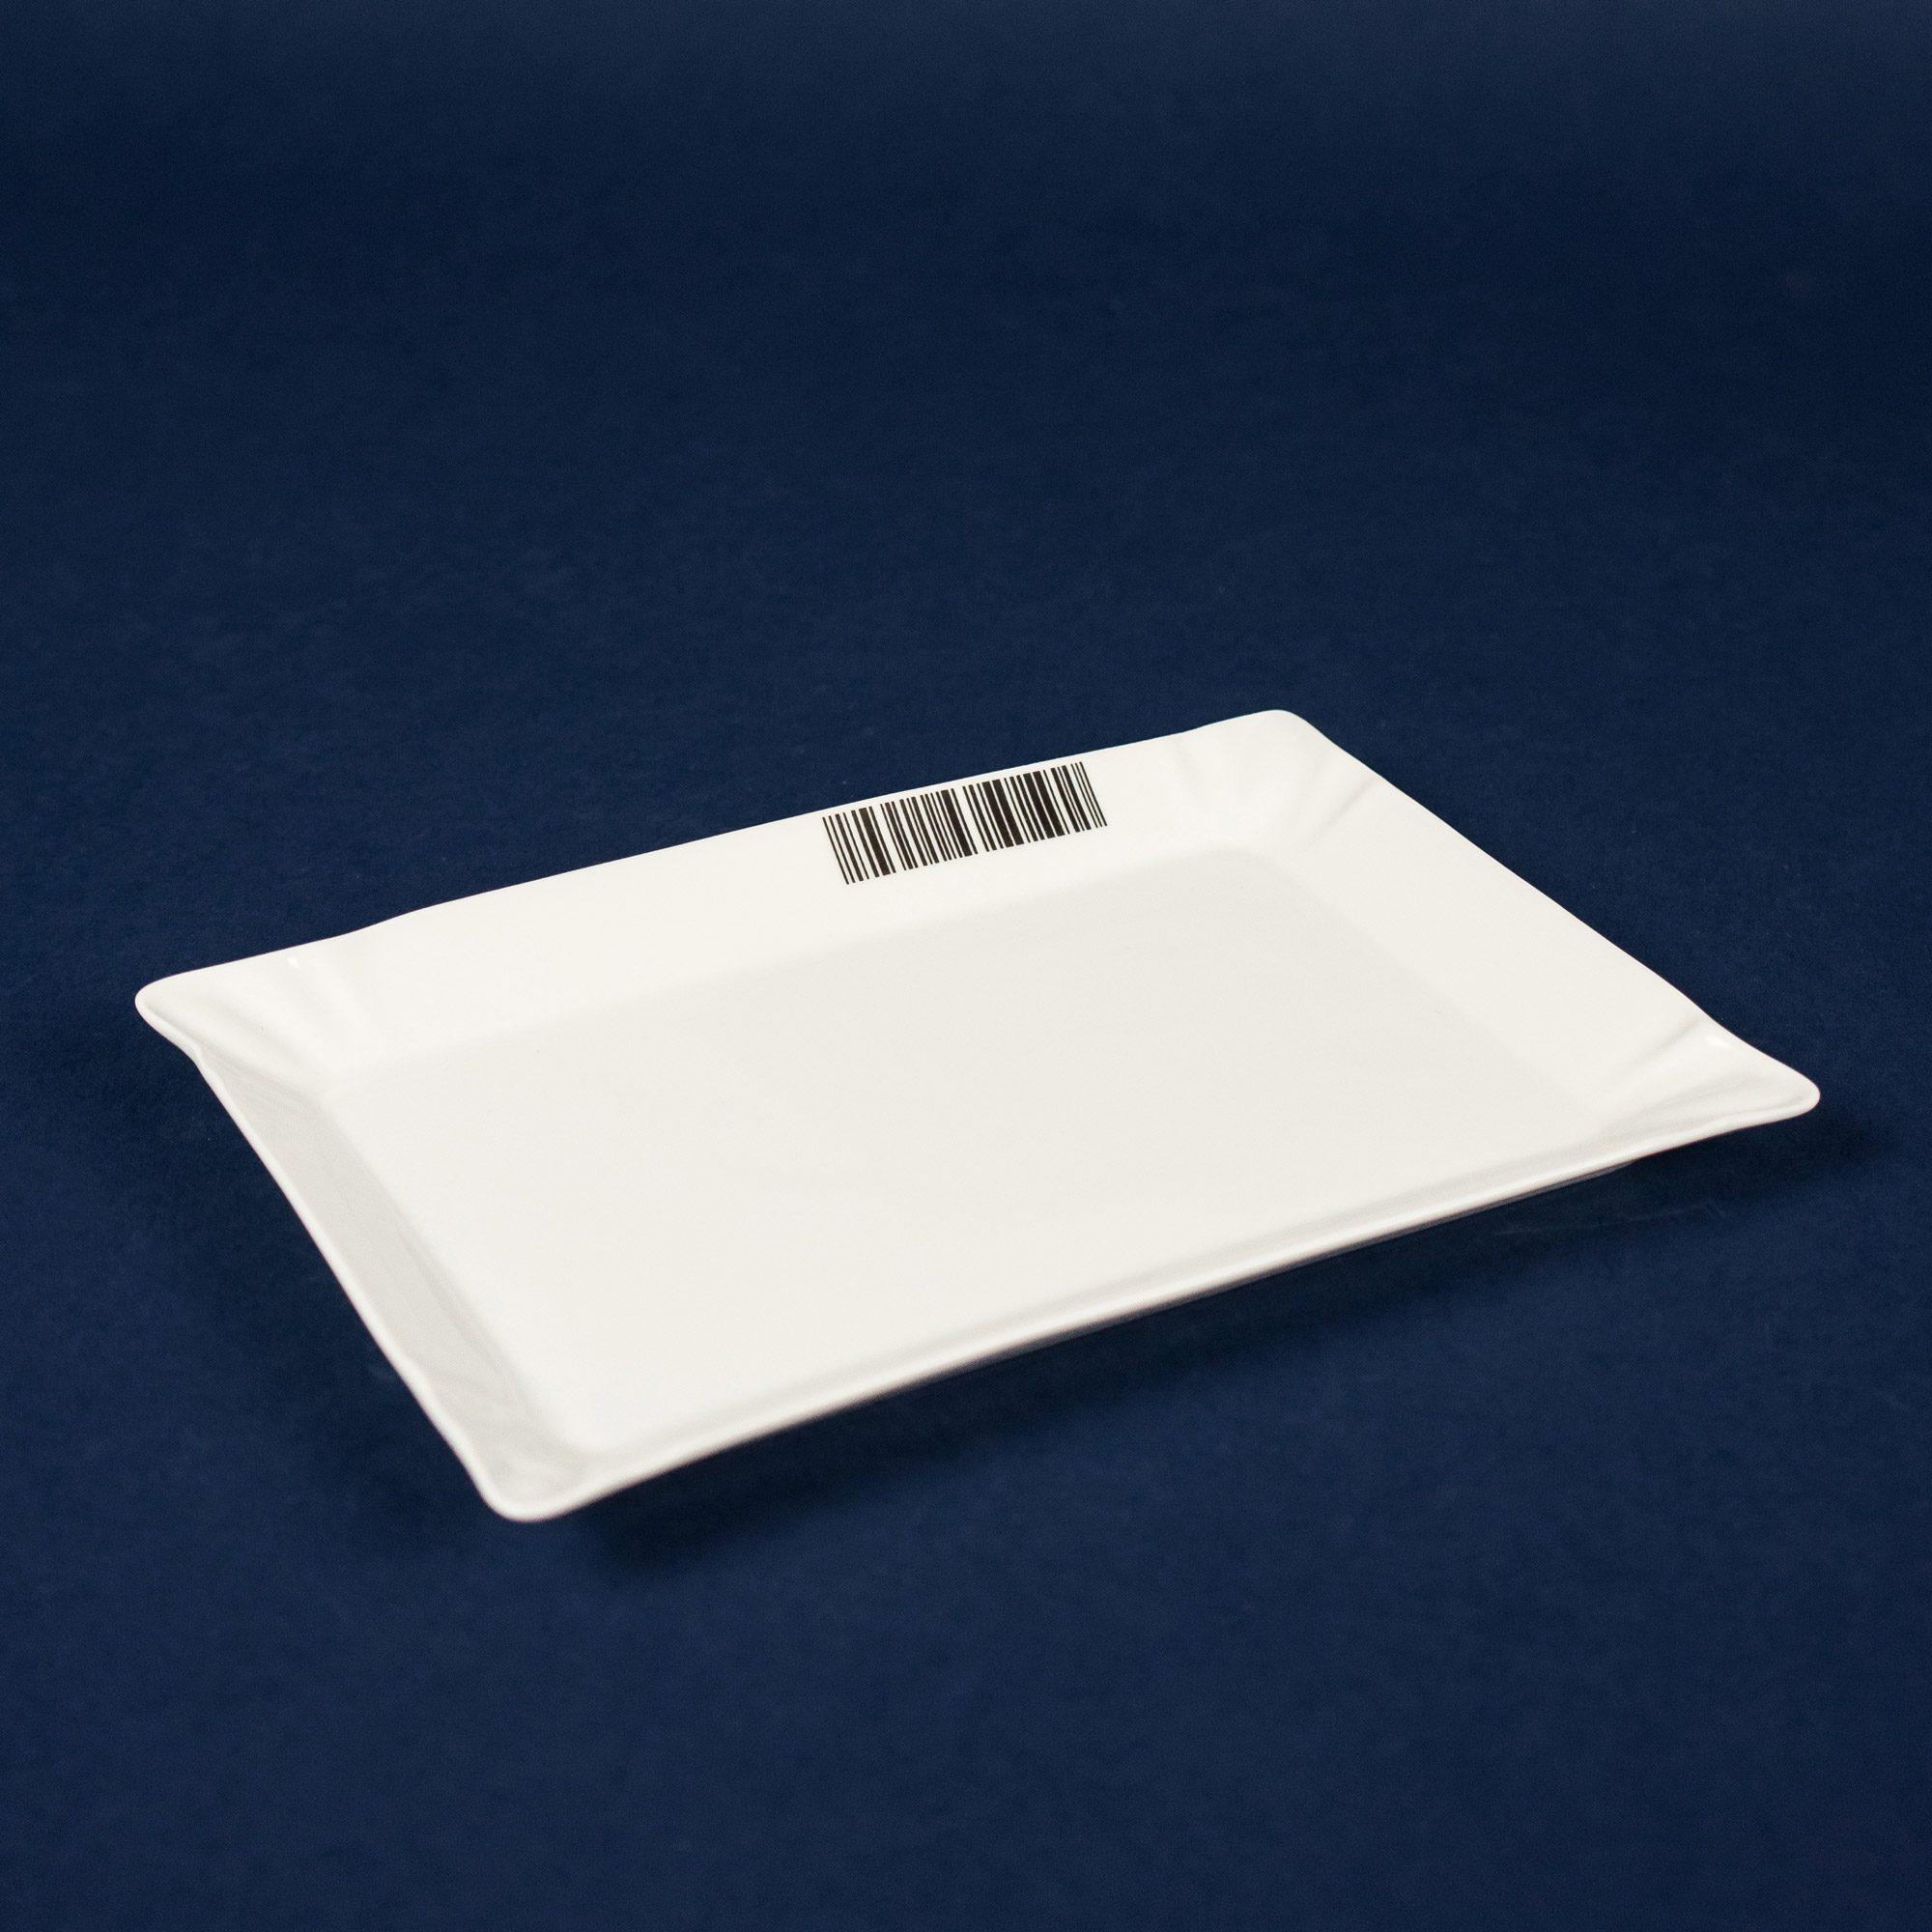 EAN tray modern design